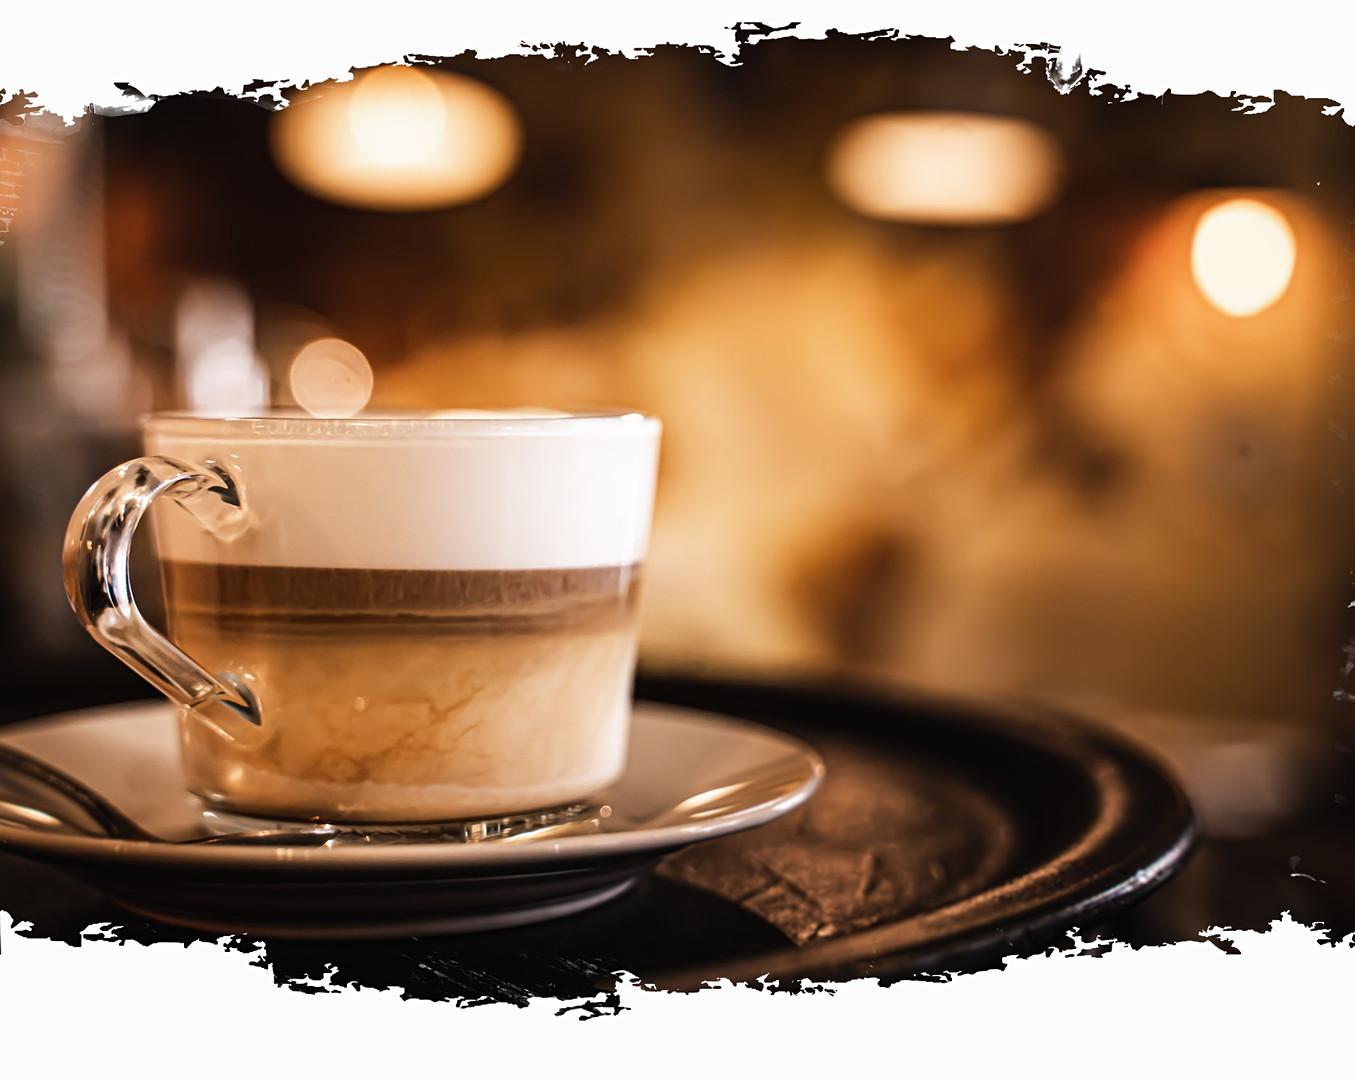 nuage cafe lyon - latte.jpg